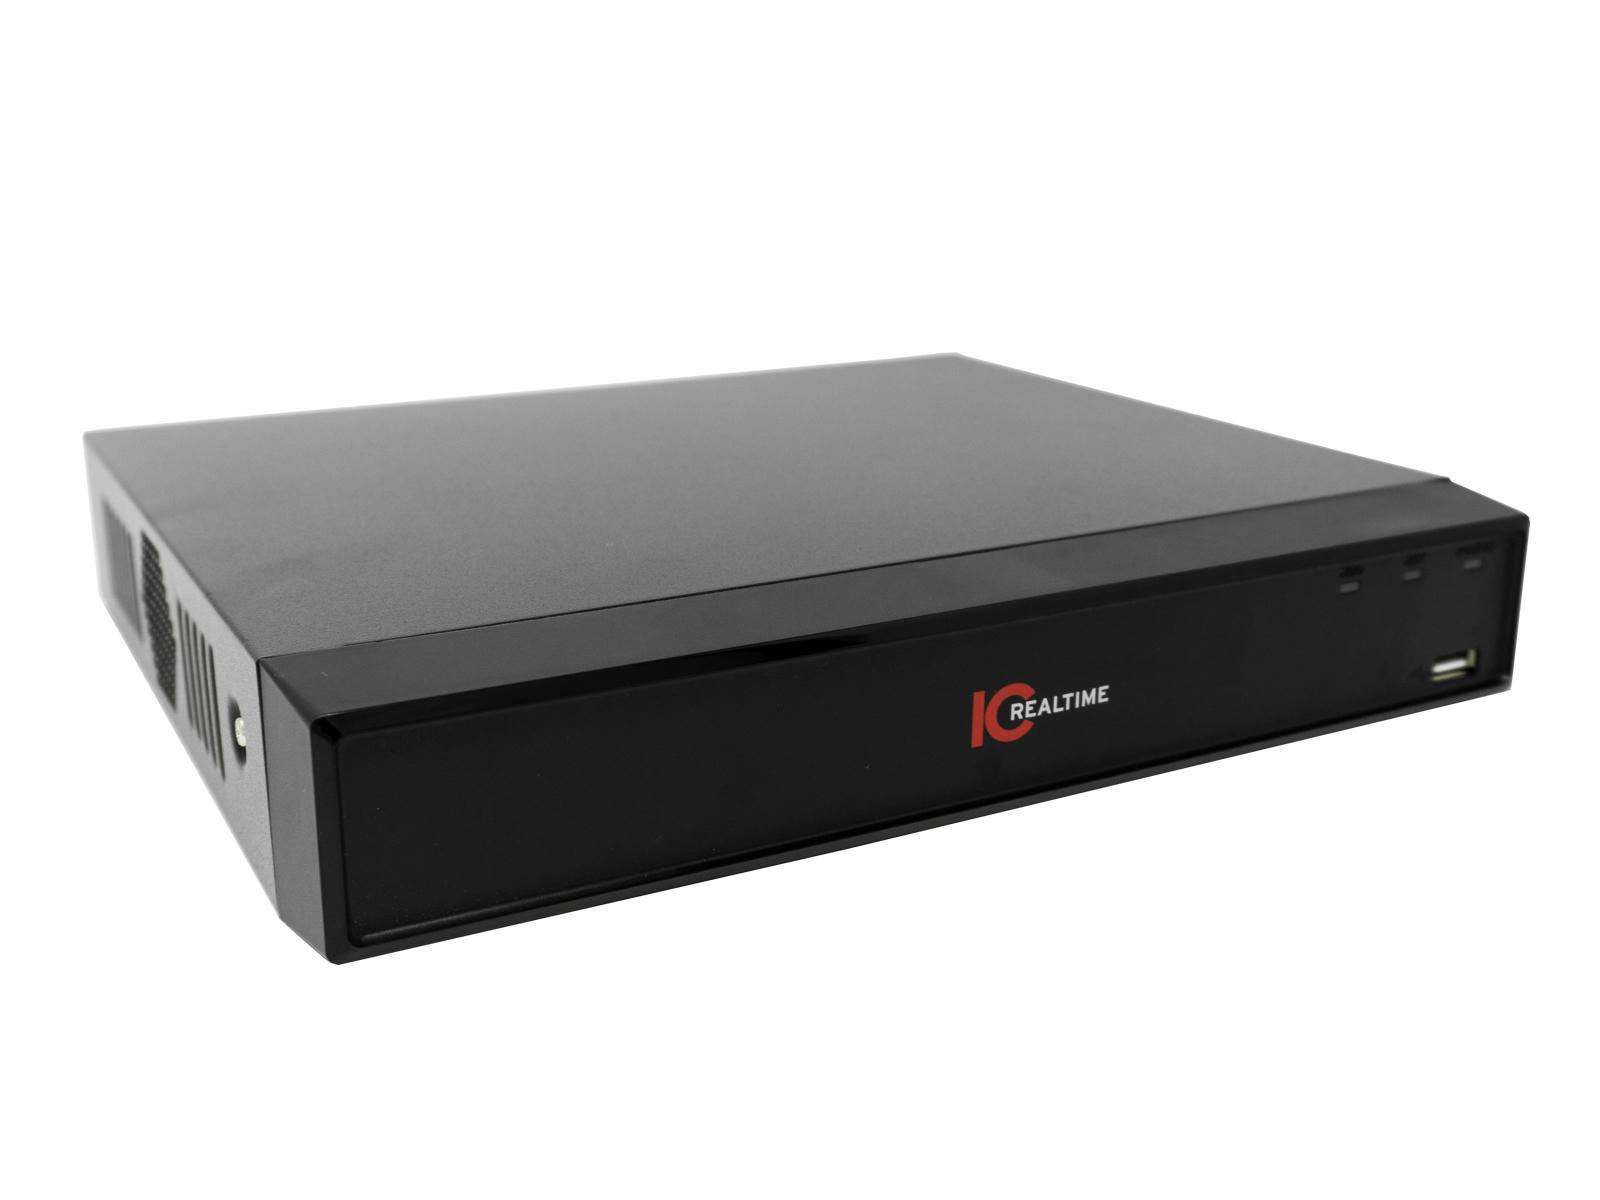 ICRealtime NVR-208NS 8 Channel 1U Shelfmount NVR/8 Port POE Switch/up to 6TB capacity